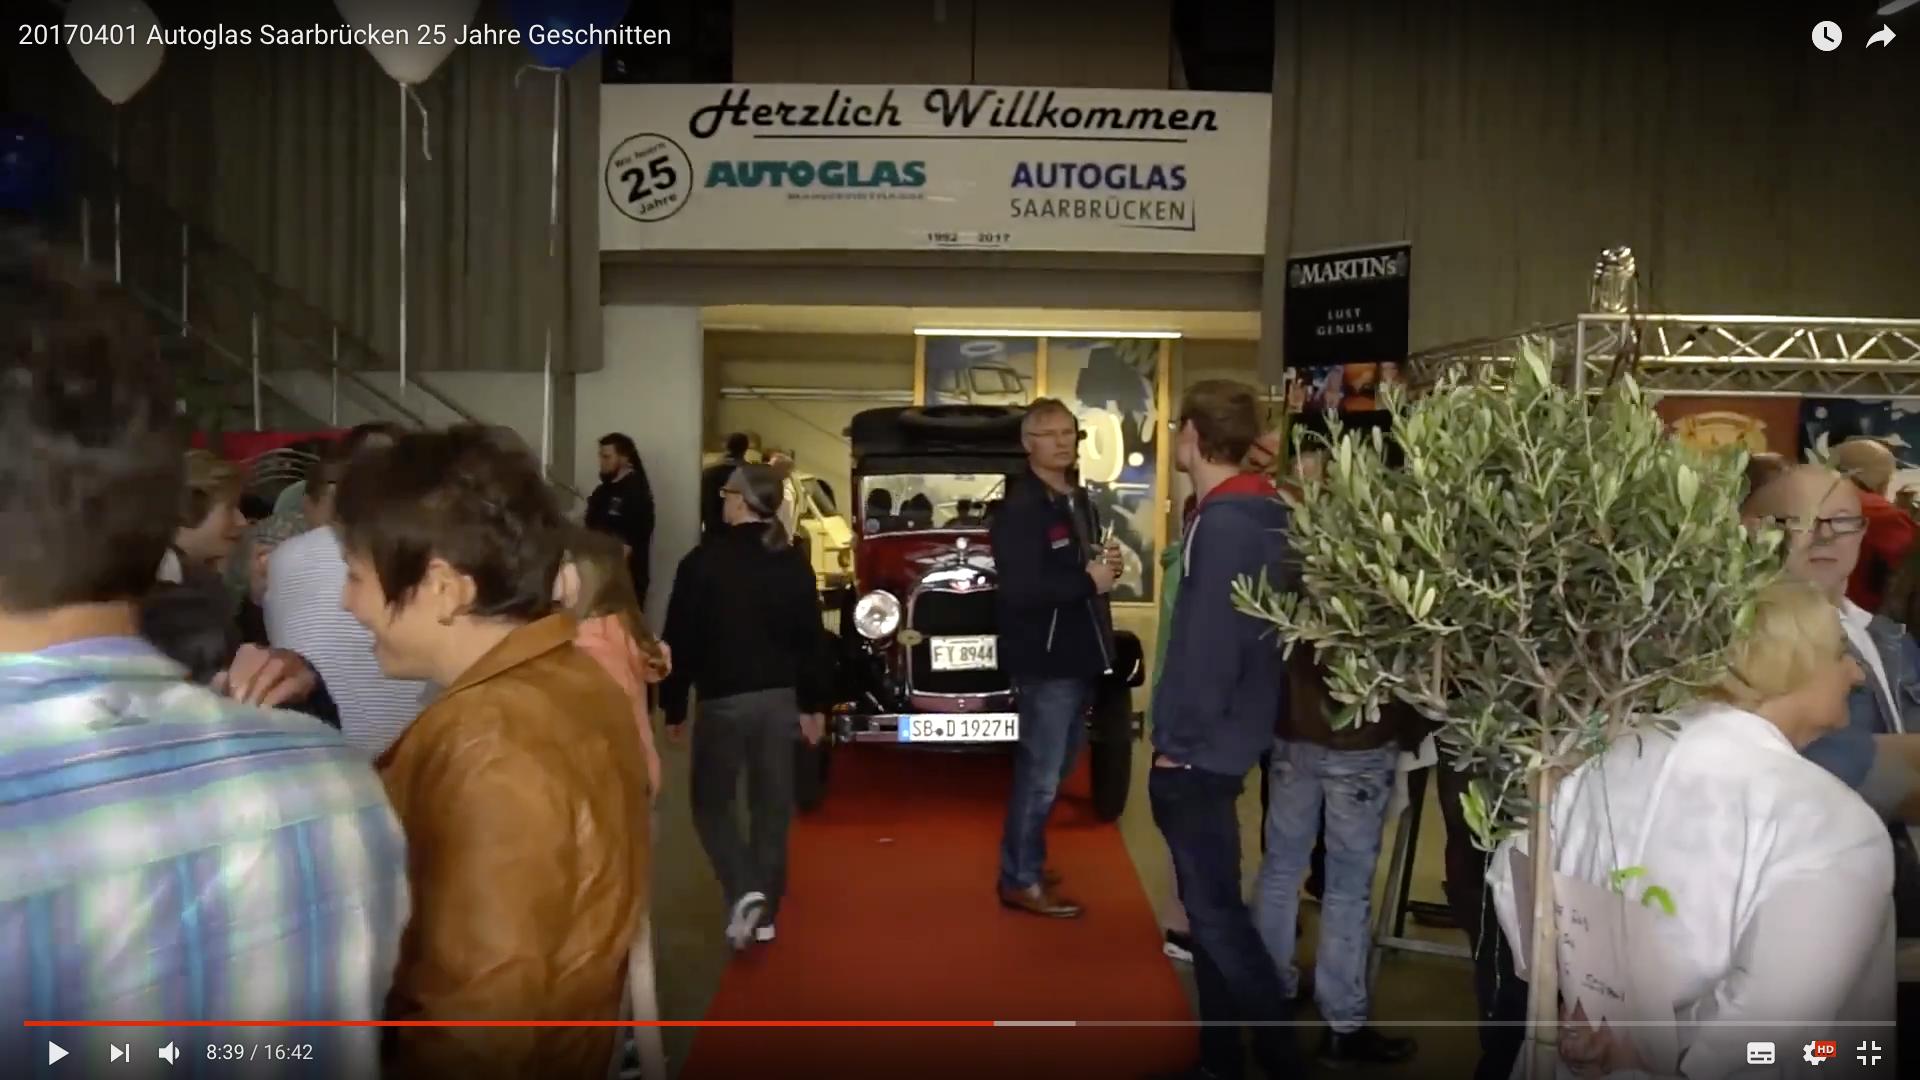 2017 Autoglas Saarbrücken 25 Jahre Event_MSM_MEDIEN_SAAR_MOSEL_SAARLAND_FERNSEHEN_1_ED_SAAR